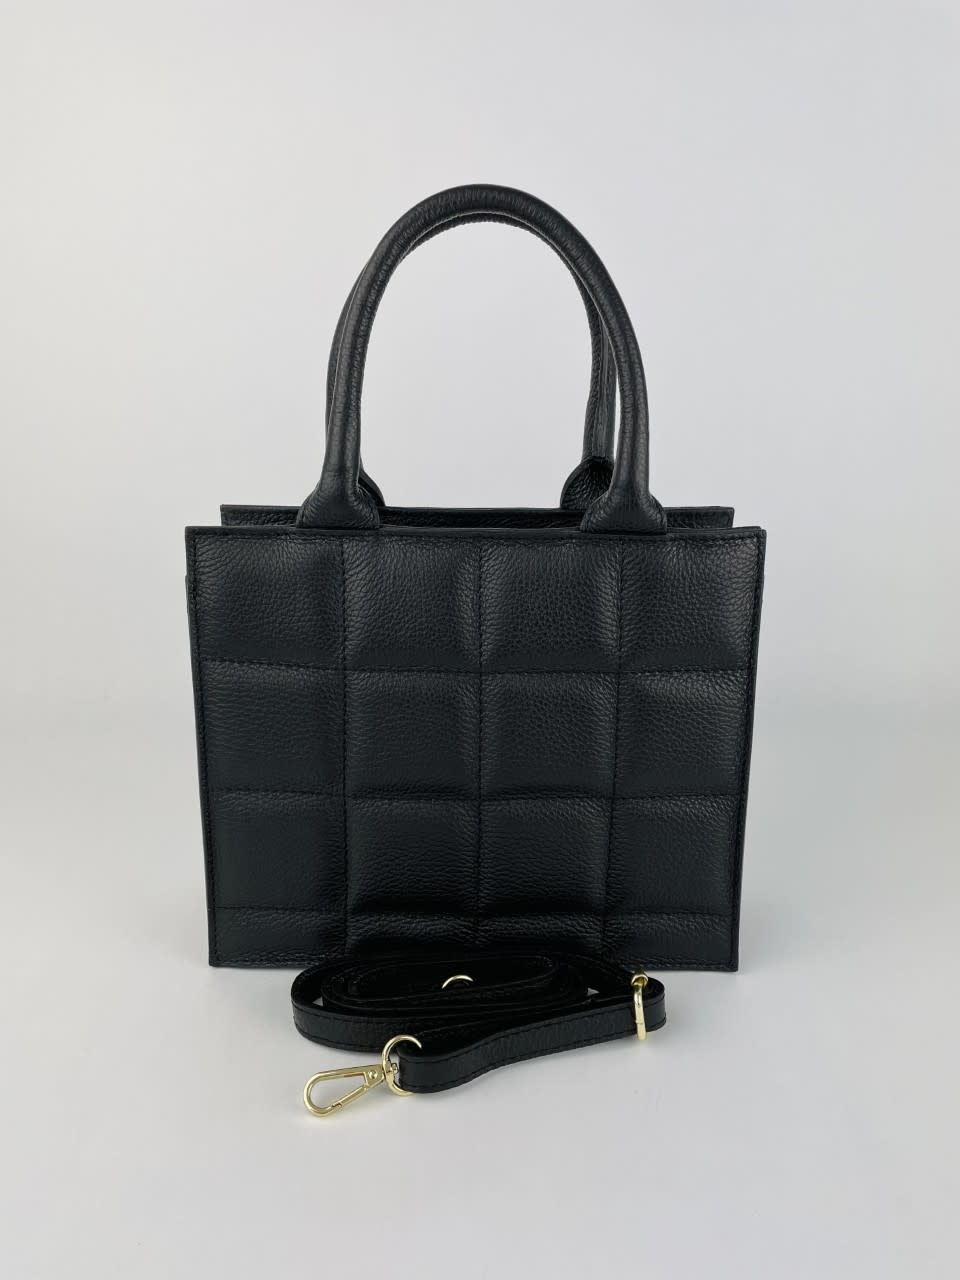 Metora leather bag Black-2